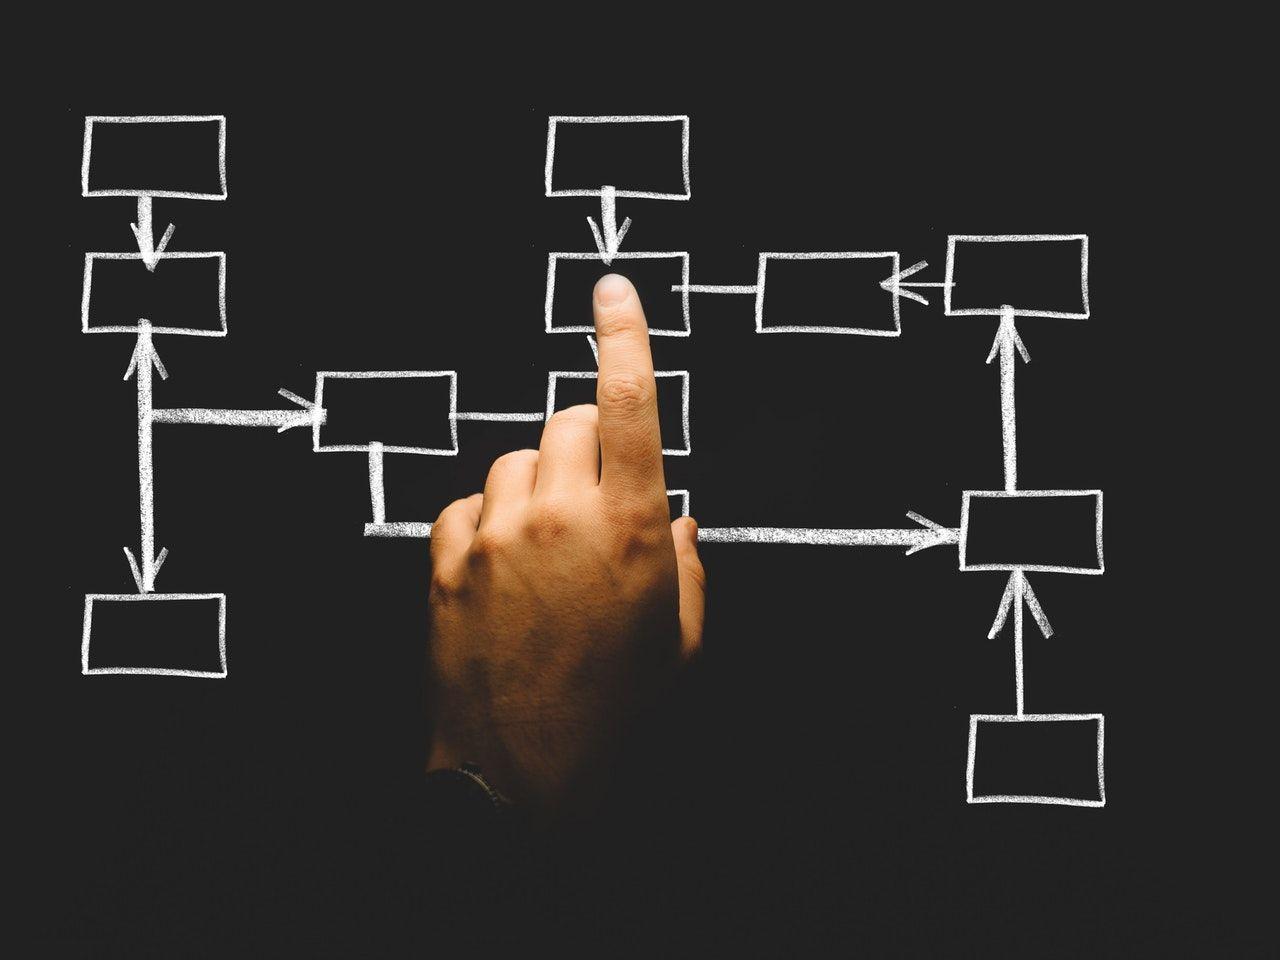 danarc strategy management